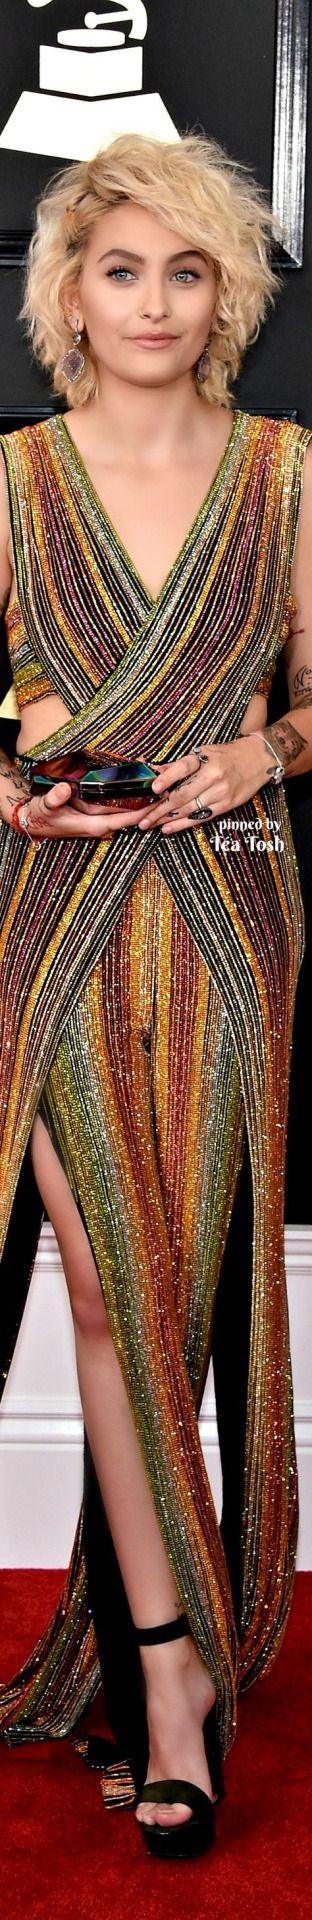 ❇Téa Tosh❇ Paris Jackson, Grammys 2017. Wearing a Balmain jumpsuit, WAR by Michael Bradley purse, and Kimberly McDonald jewels.